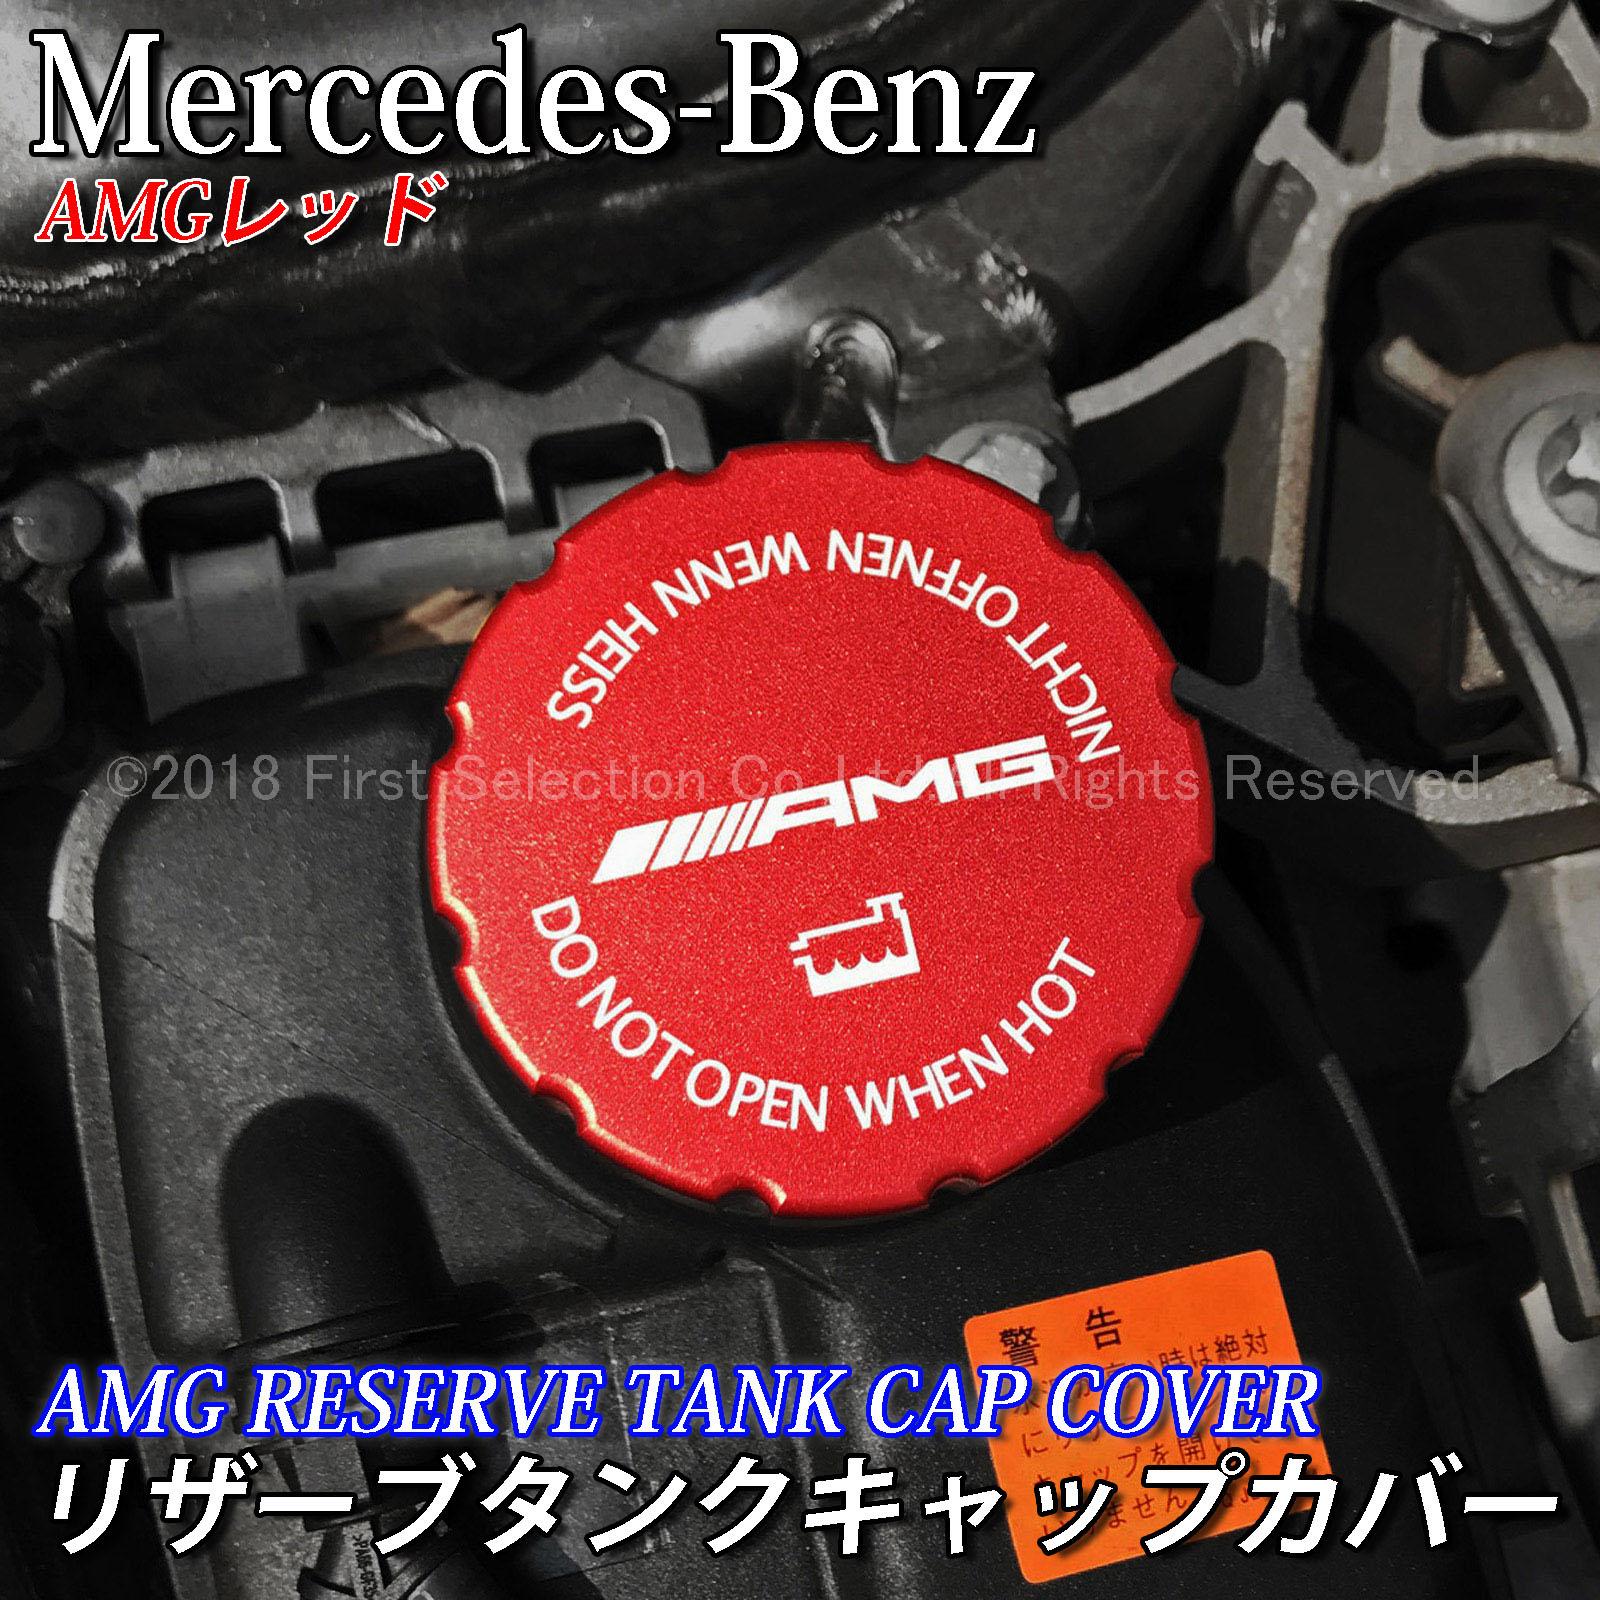 Mercedes-Benz ベンツ用 AMGロゴ 汎用リザーブタンクキャップカバー 赤